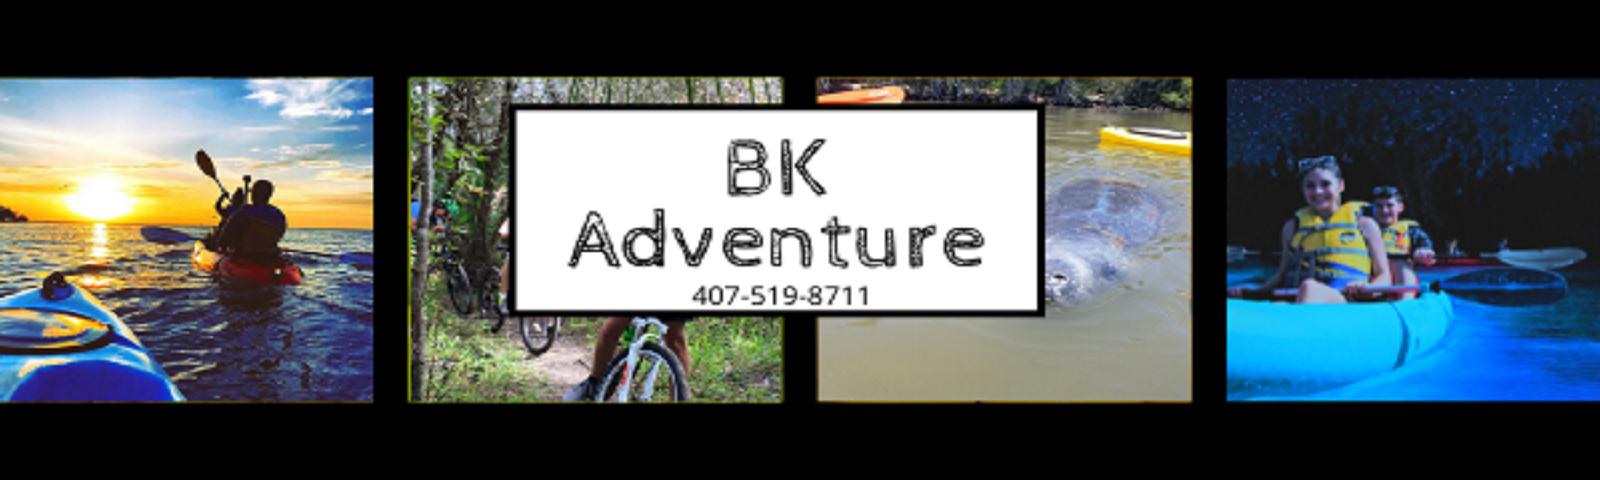 BK Adventure Florida Tours 2020